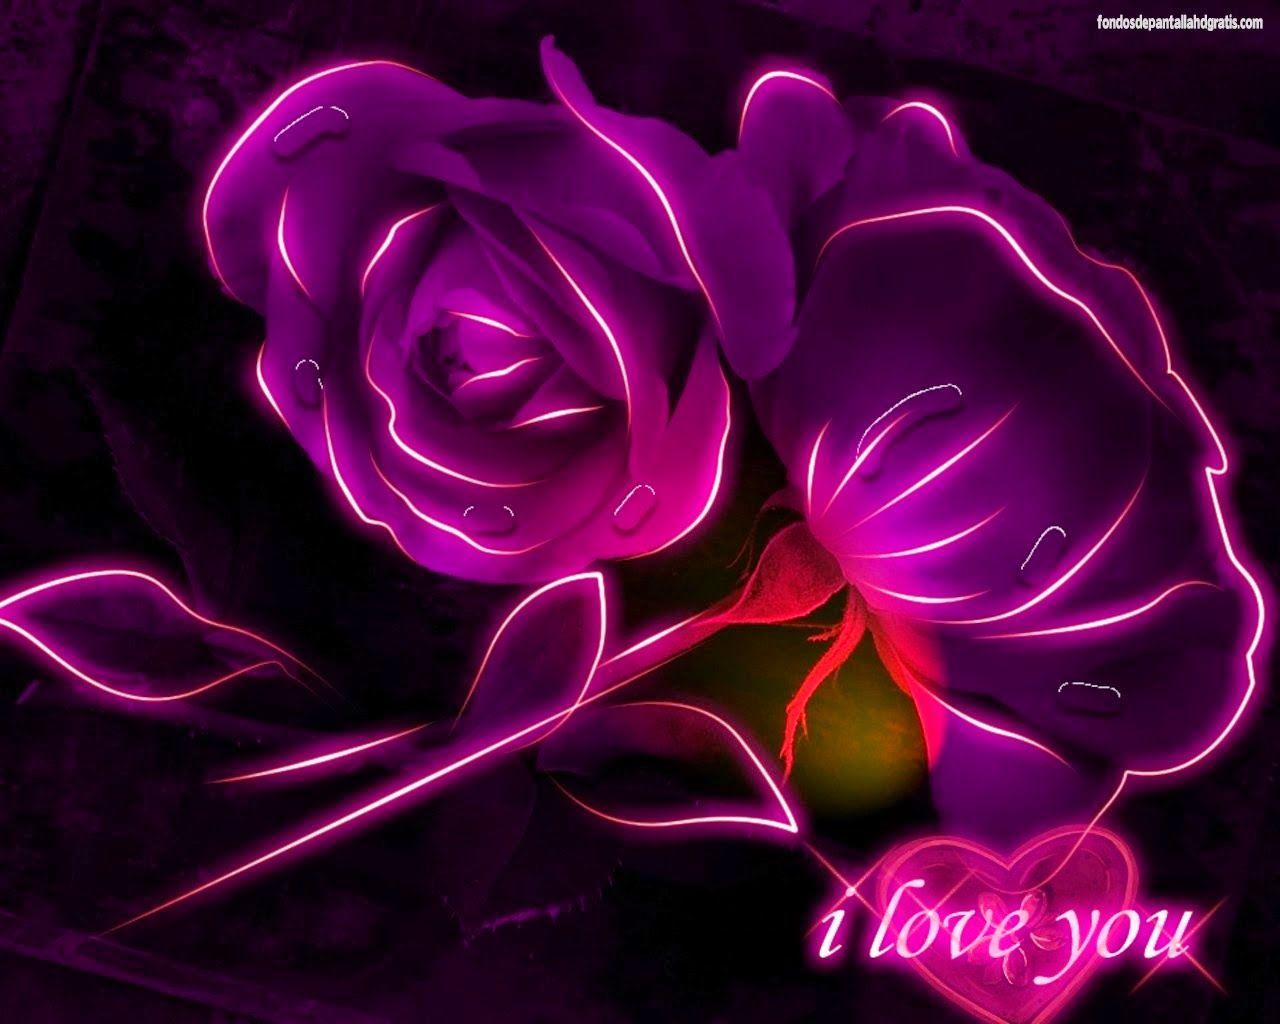 Ver gratis imagenes de amor para fondo de pantalla en 3d 1 for Bajar fondos de pantalla gratis para celular